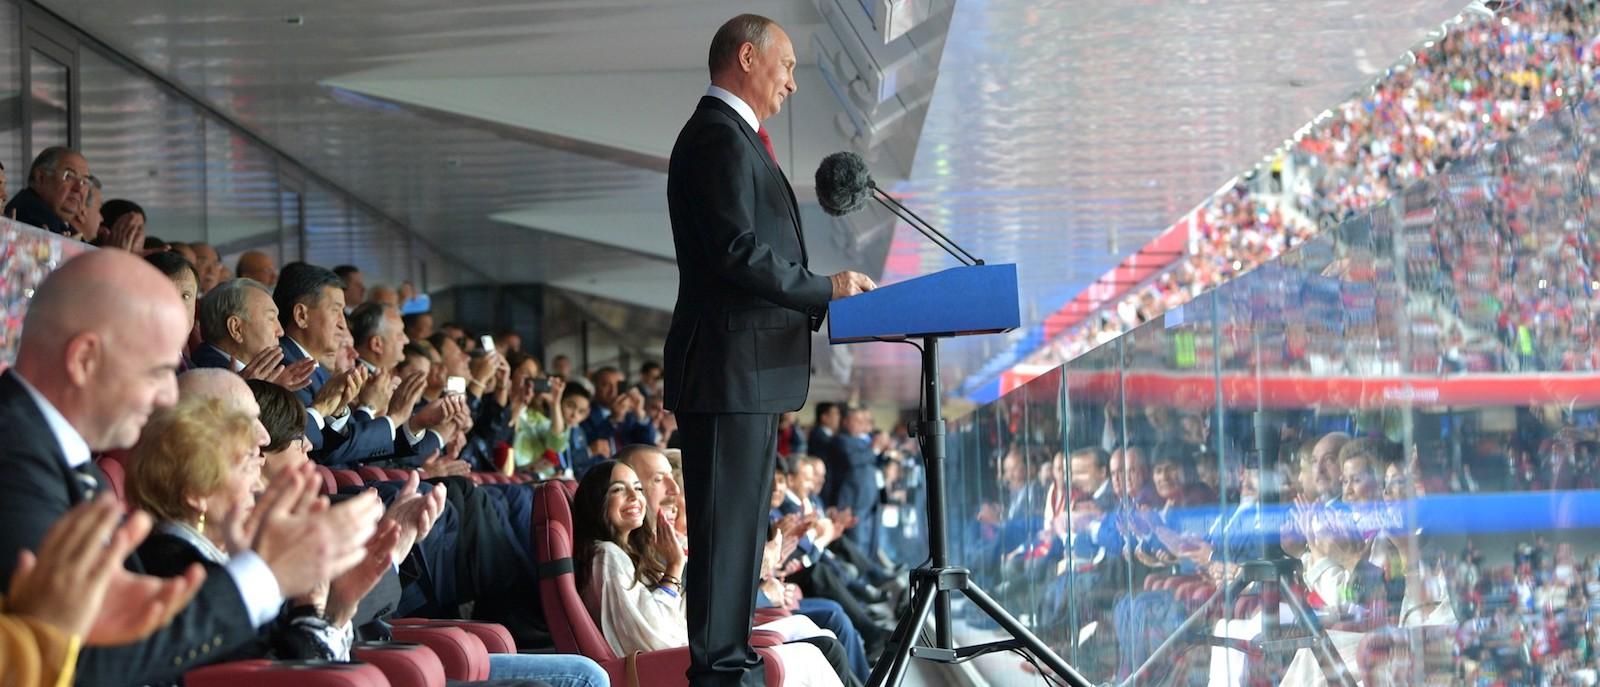 Russian President Vladimir Putin at the opening of the 2018 FIFA World Cup (Photo: Kremlin.ru)